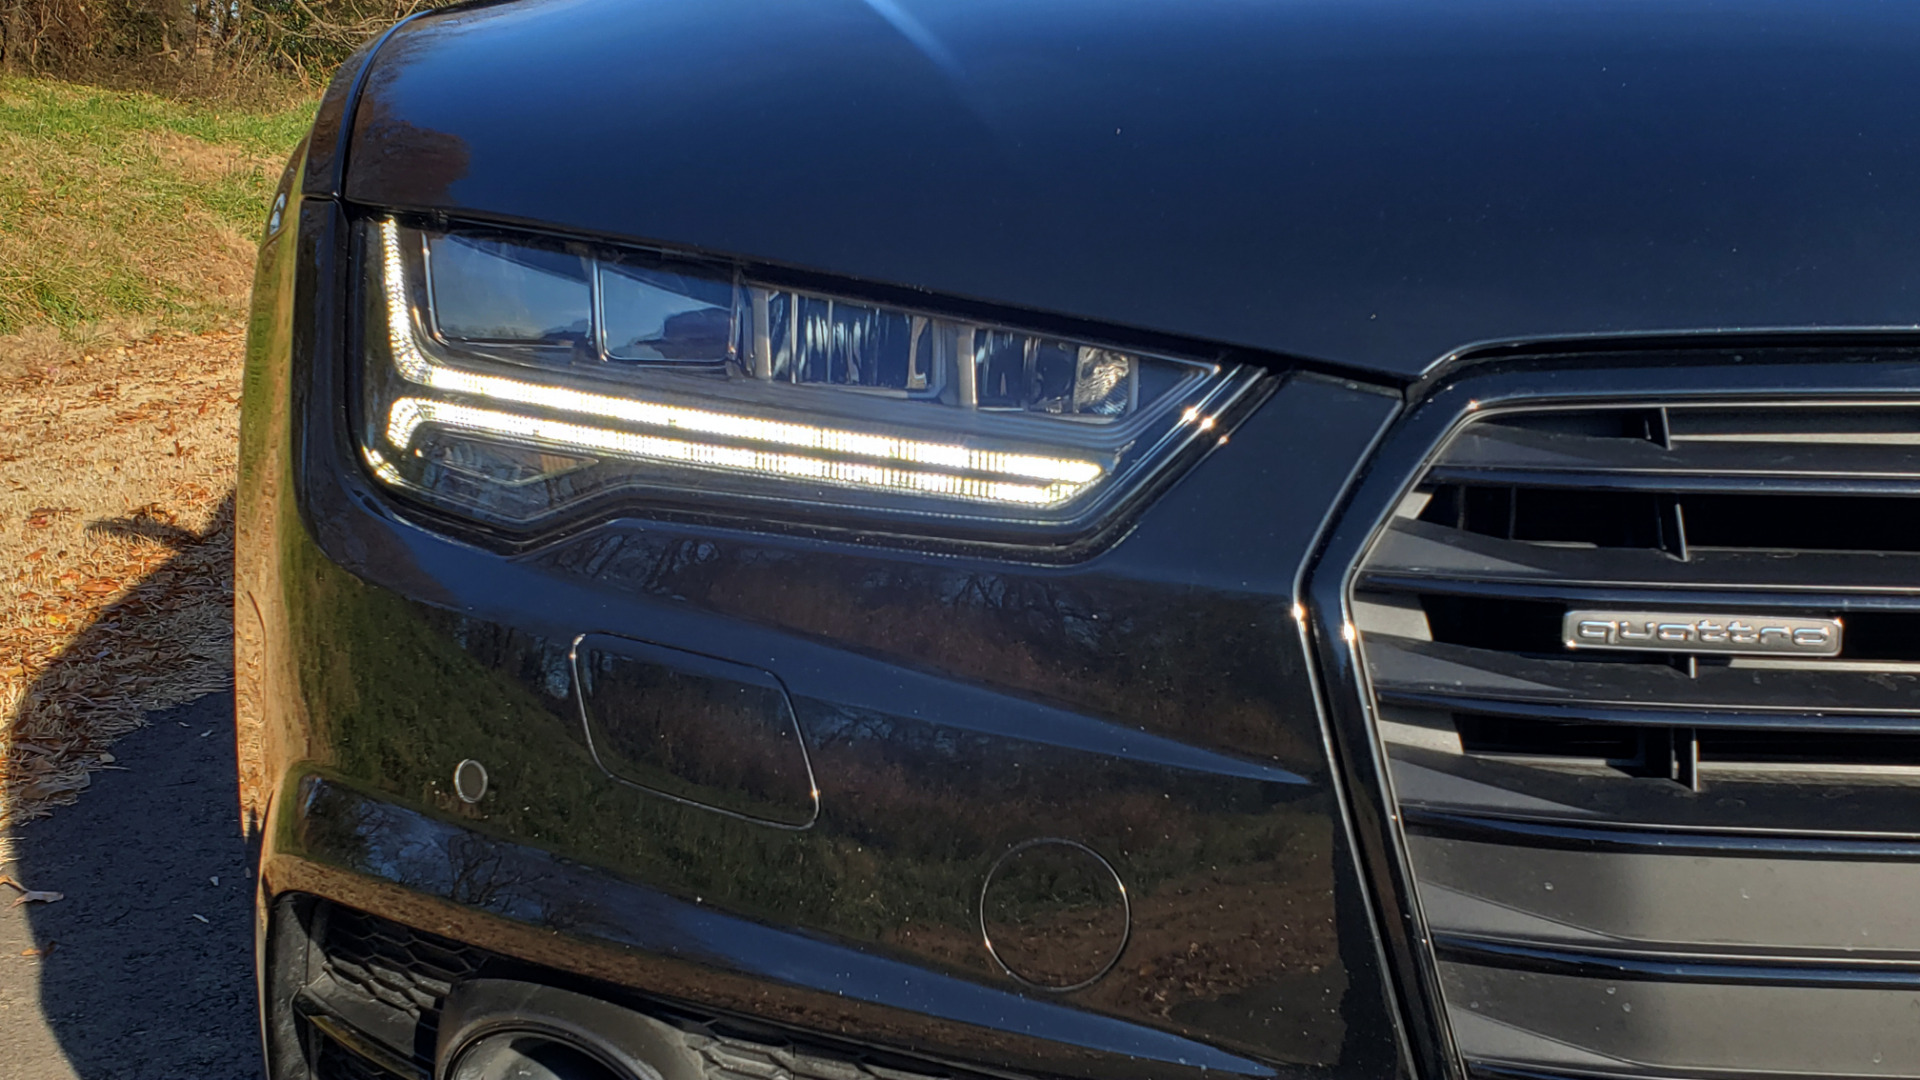 Used 2017 Audi A7 PRESTIGE / DRVR ASST / S-LINE SPORT / NAV / REARVIEW for sale Sold at Formula Imports in Charlotte NC 28227 11